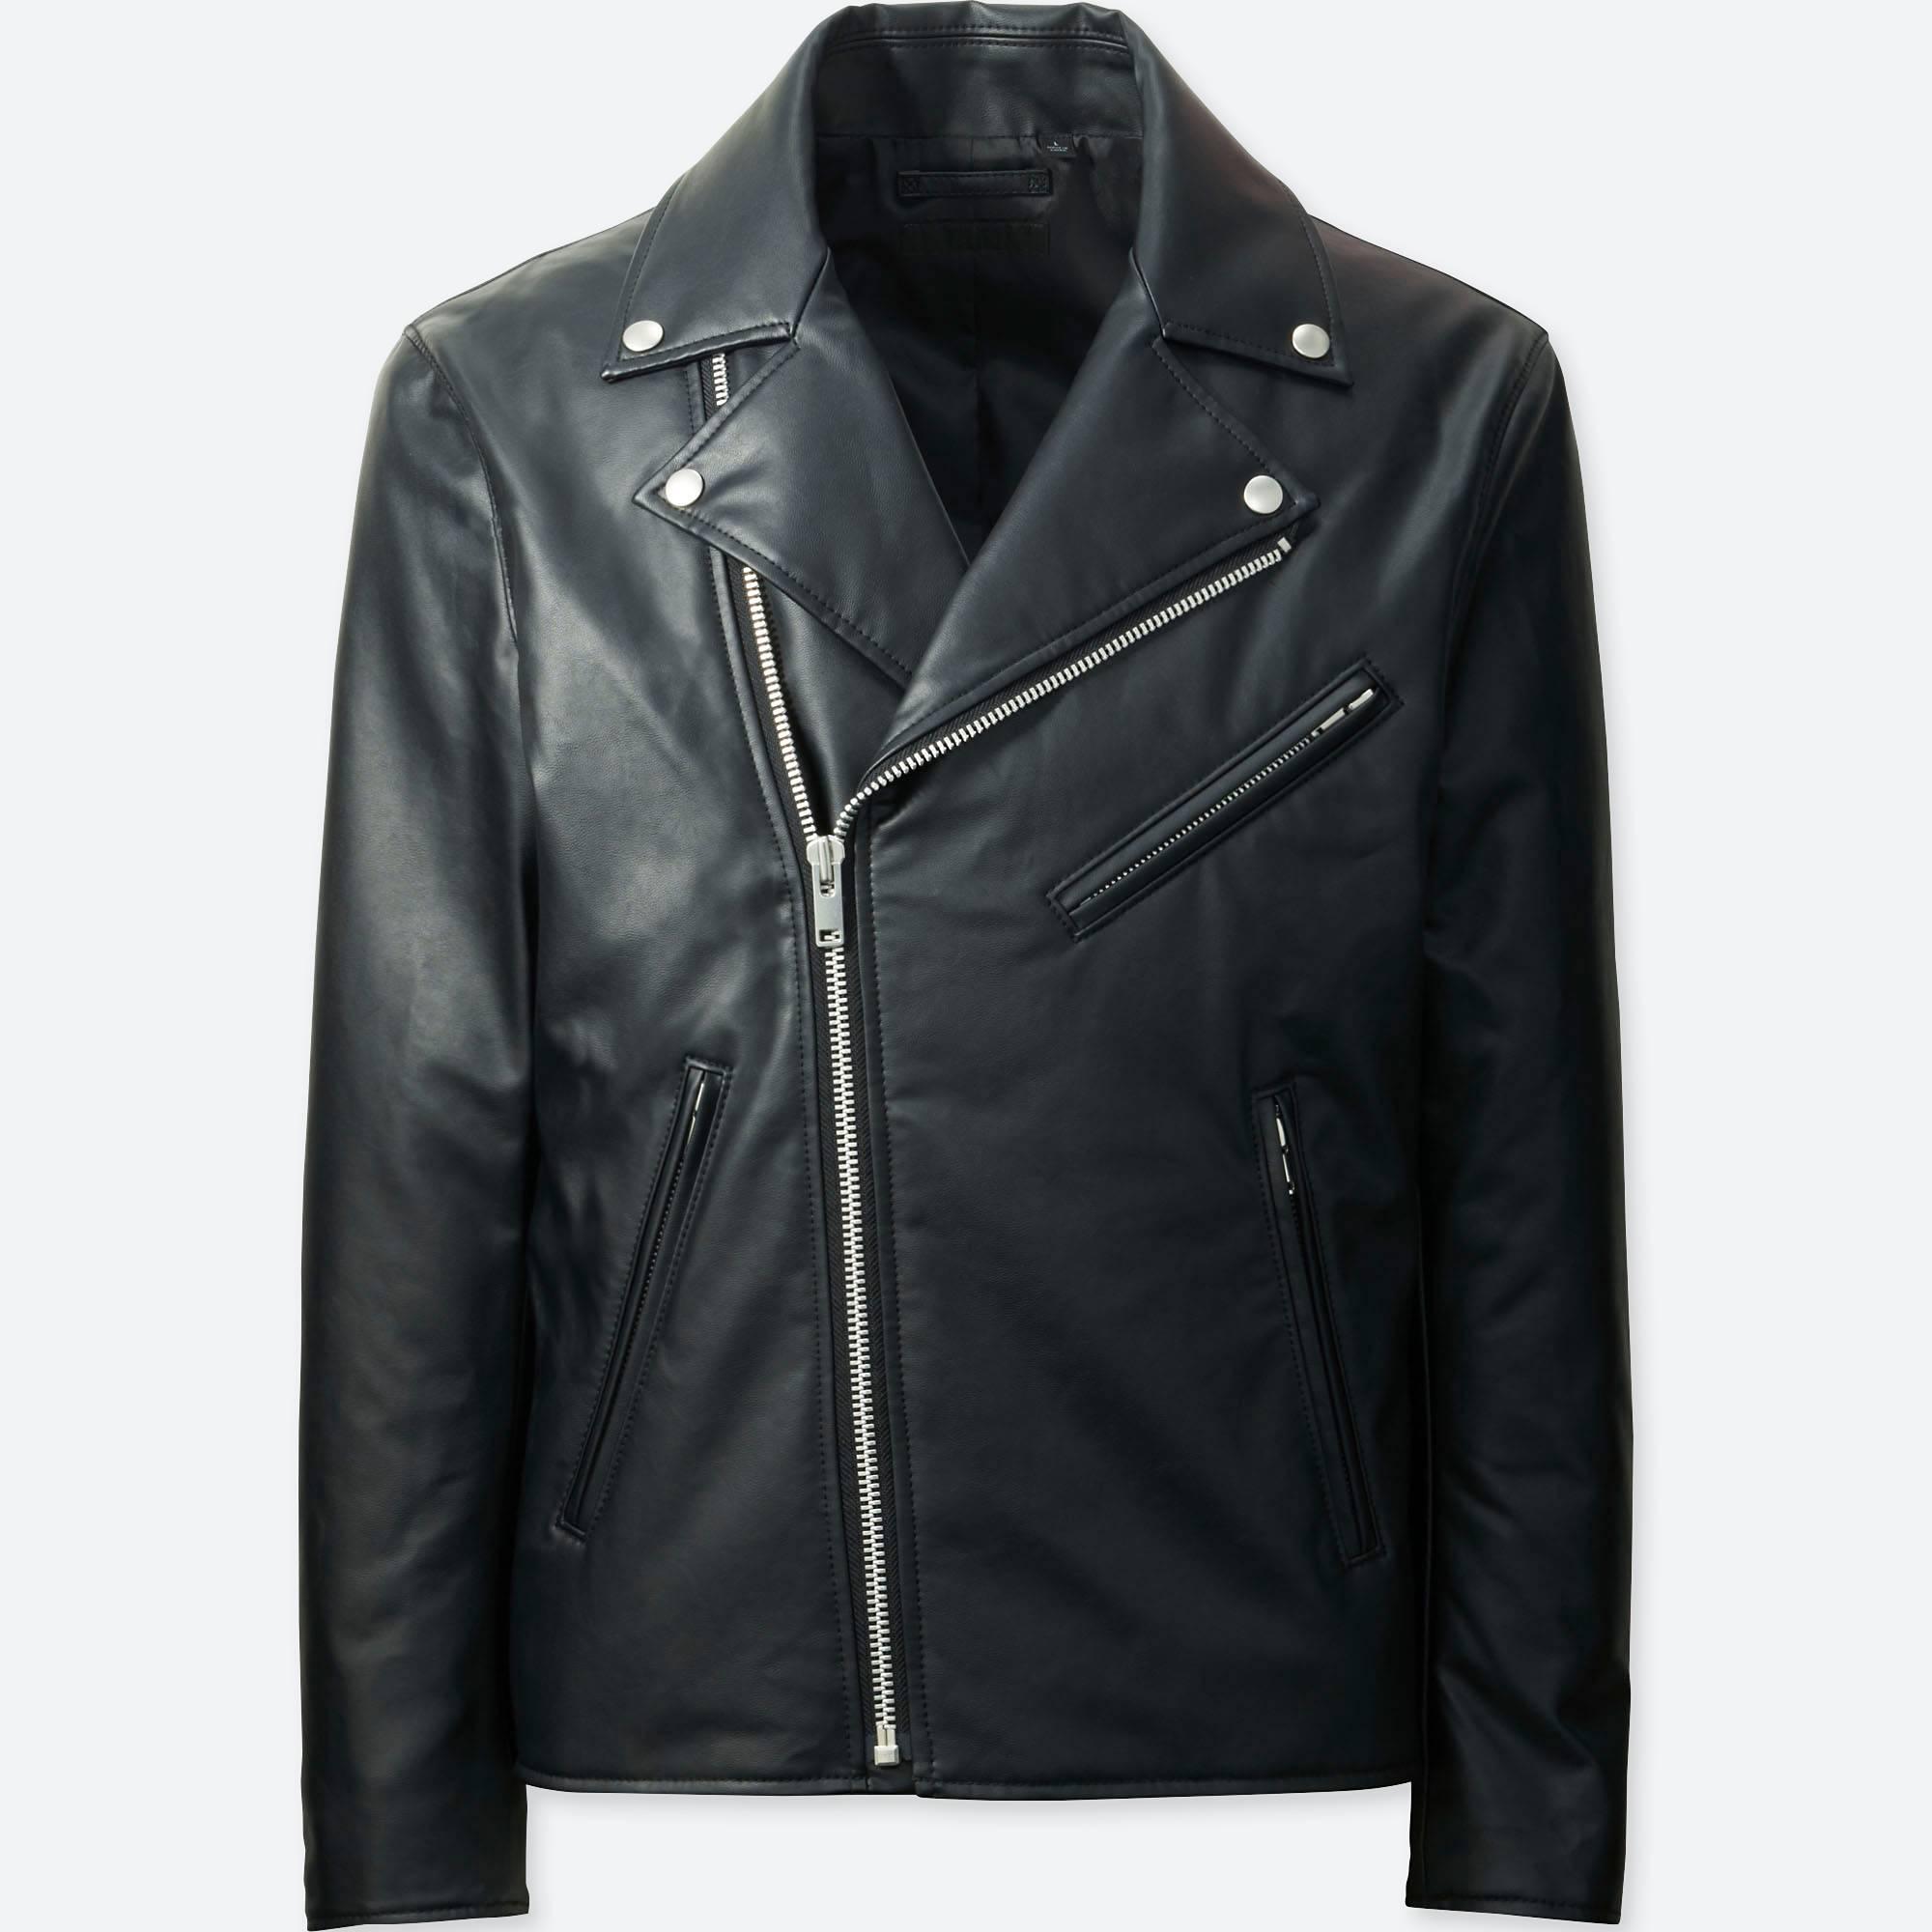 Vegan leather jacket men